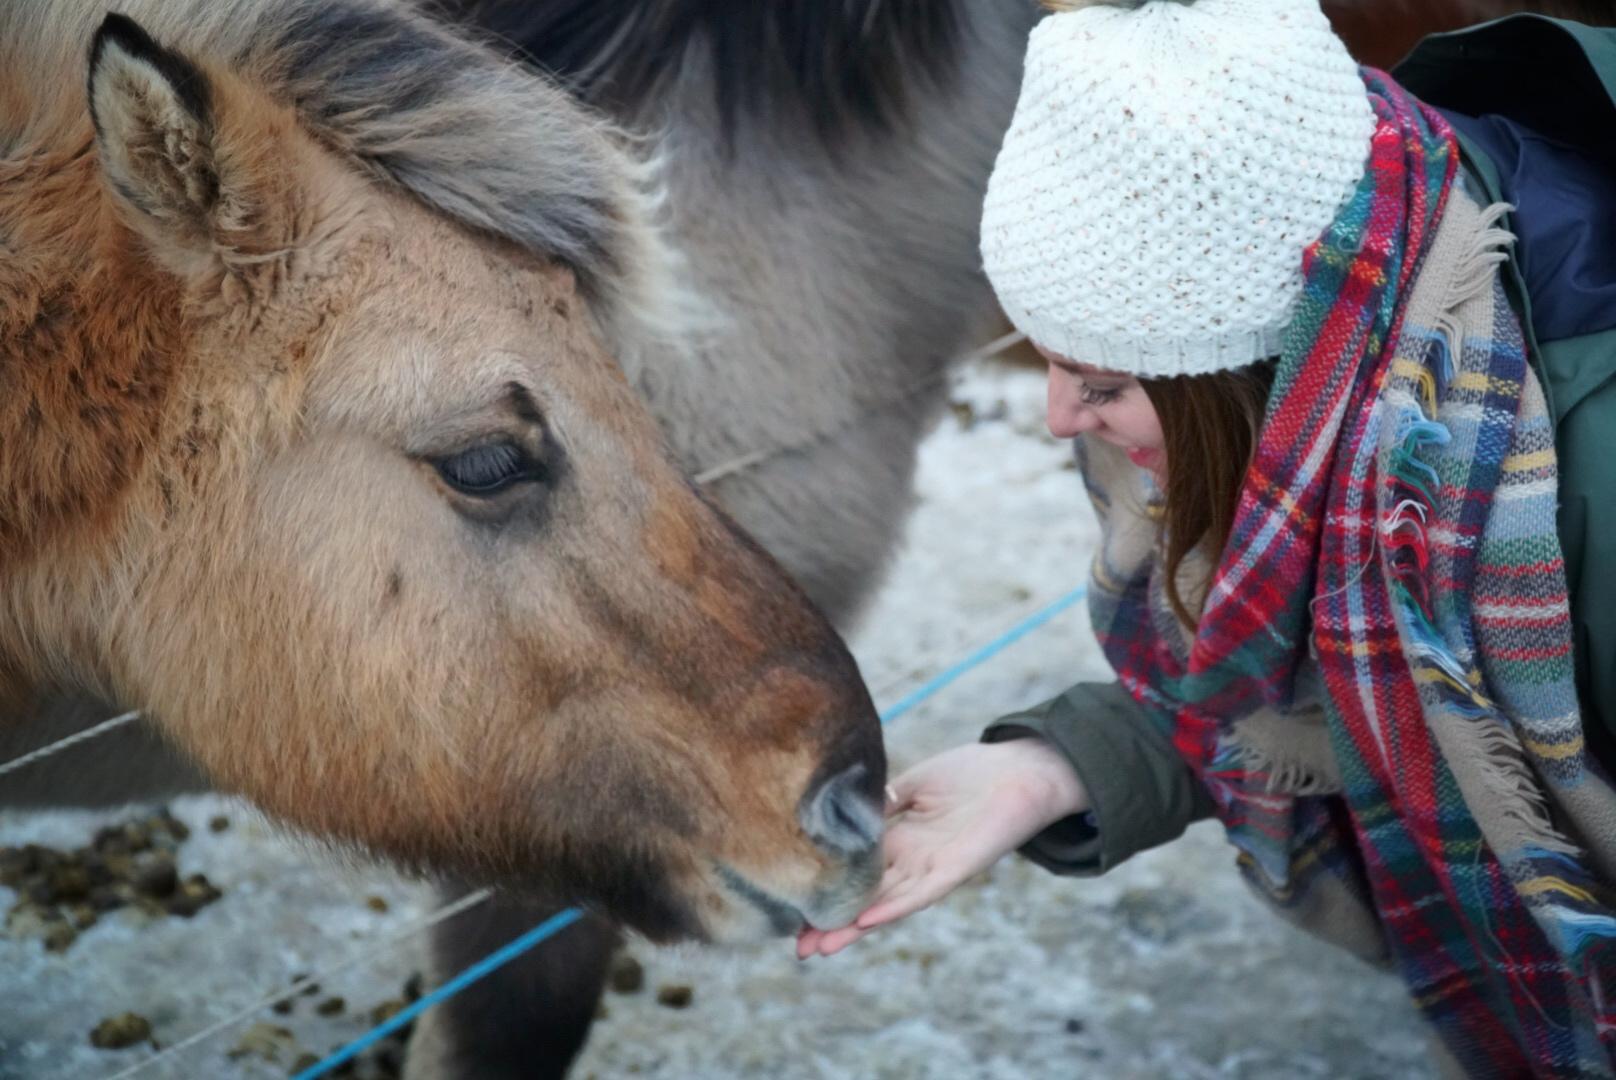 Horseback Riding Date - Romantic Date ideas